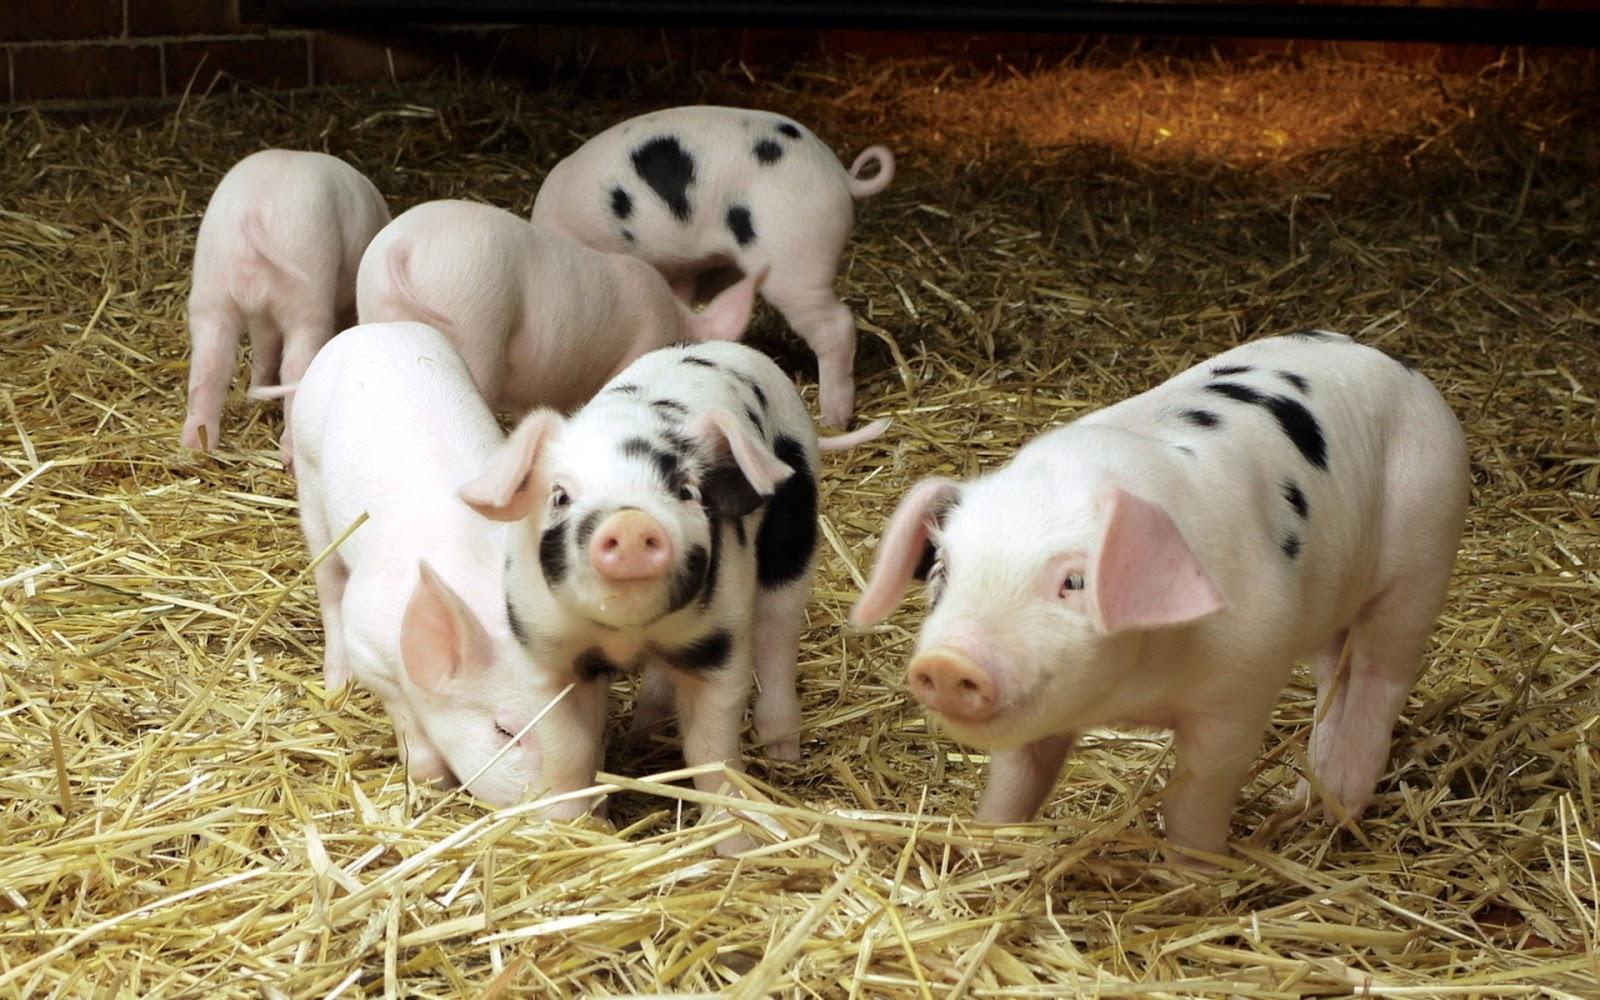 Cute Pigs Mystery Wallpaper 1600x1000